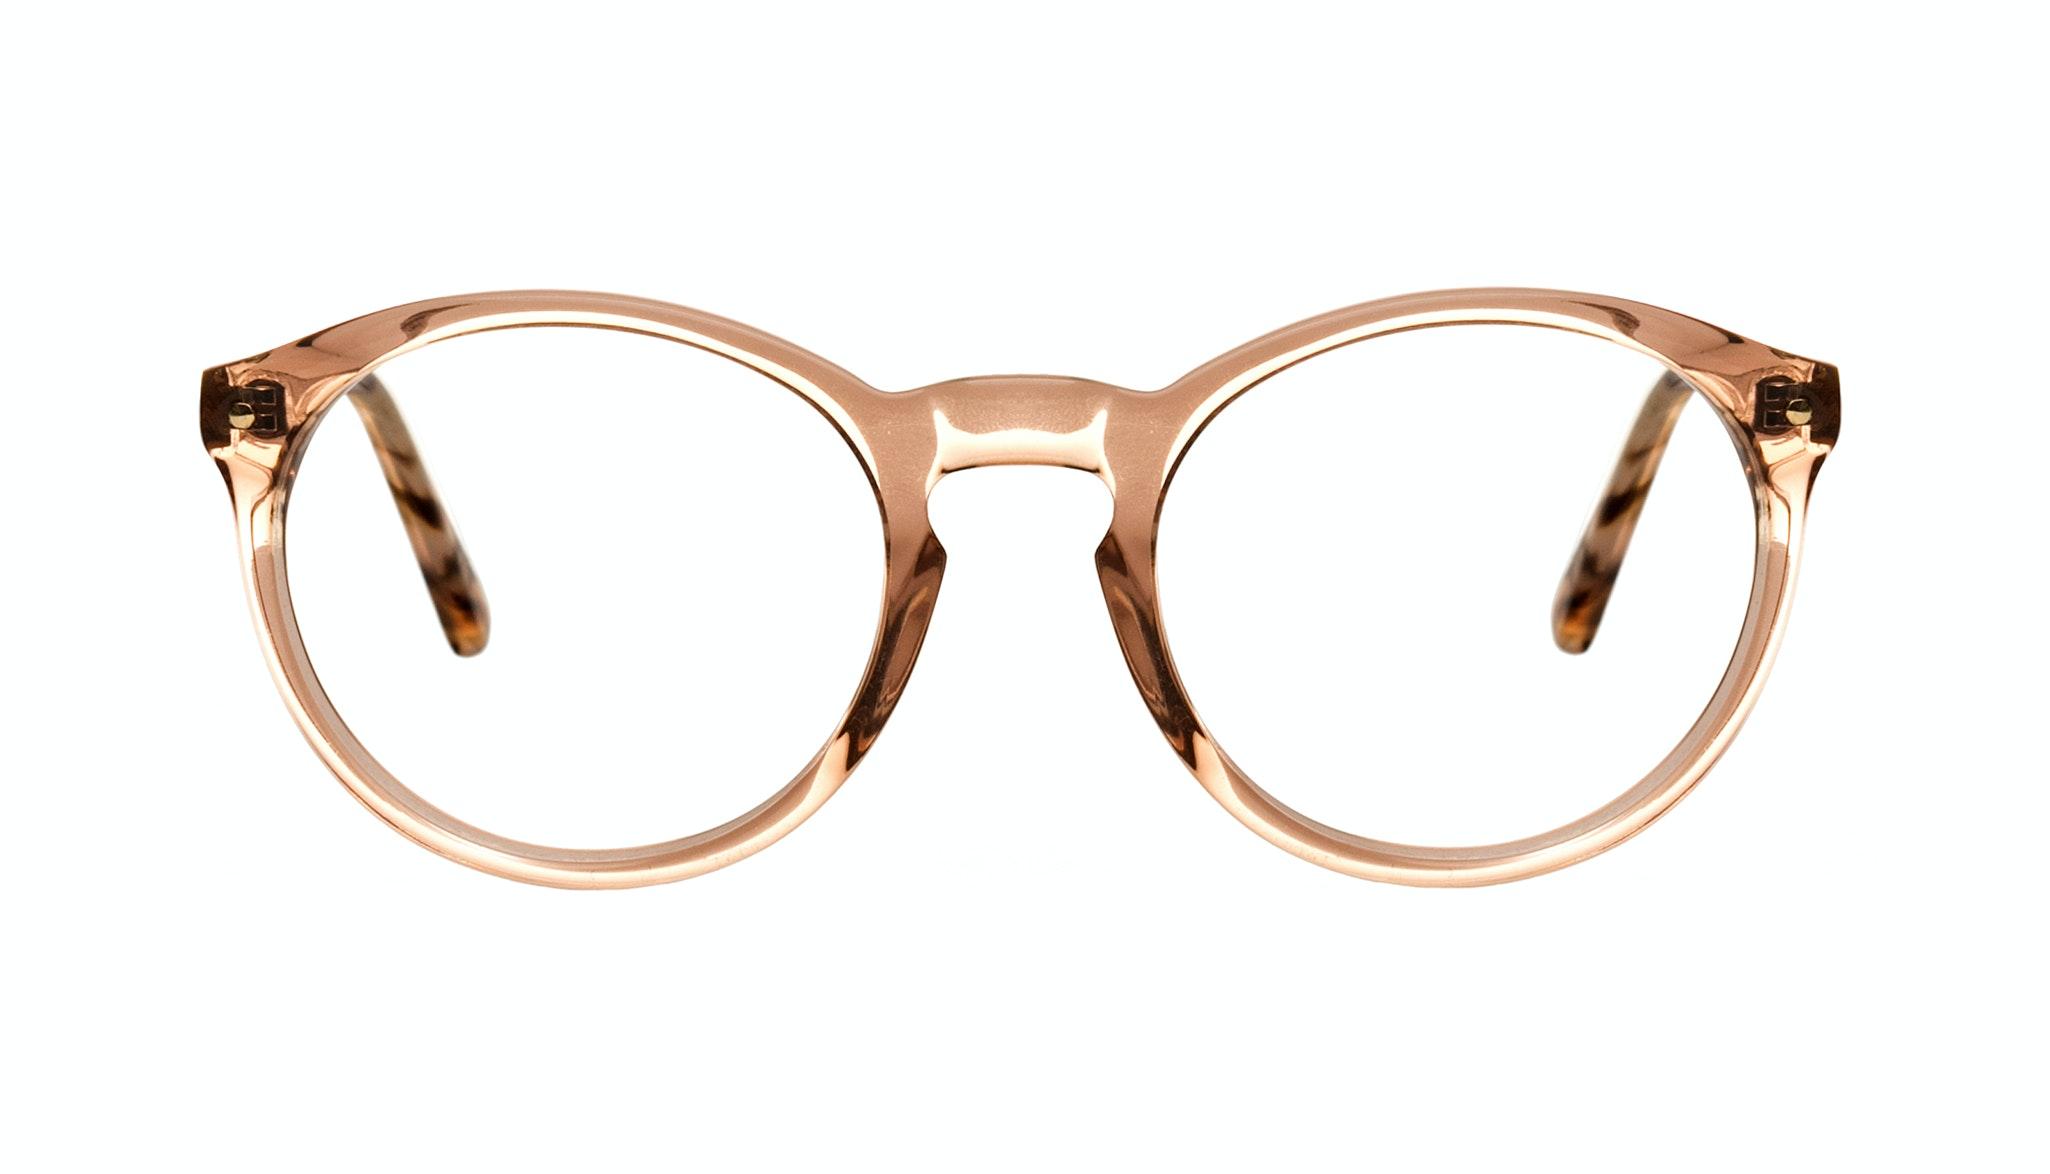 Affordable Fashion Glasses Round Eyeglasses Women Glow Pink Tortoise Front